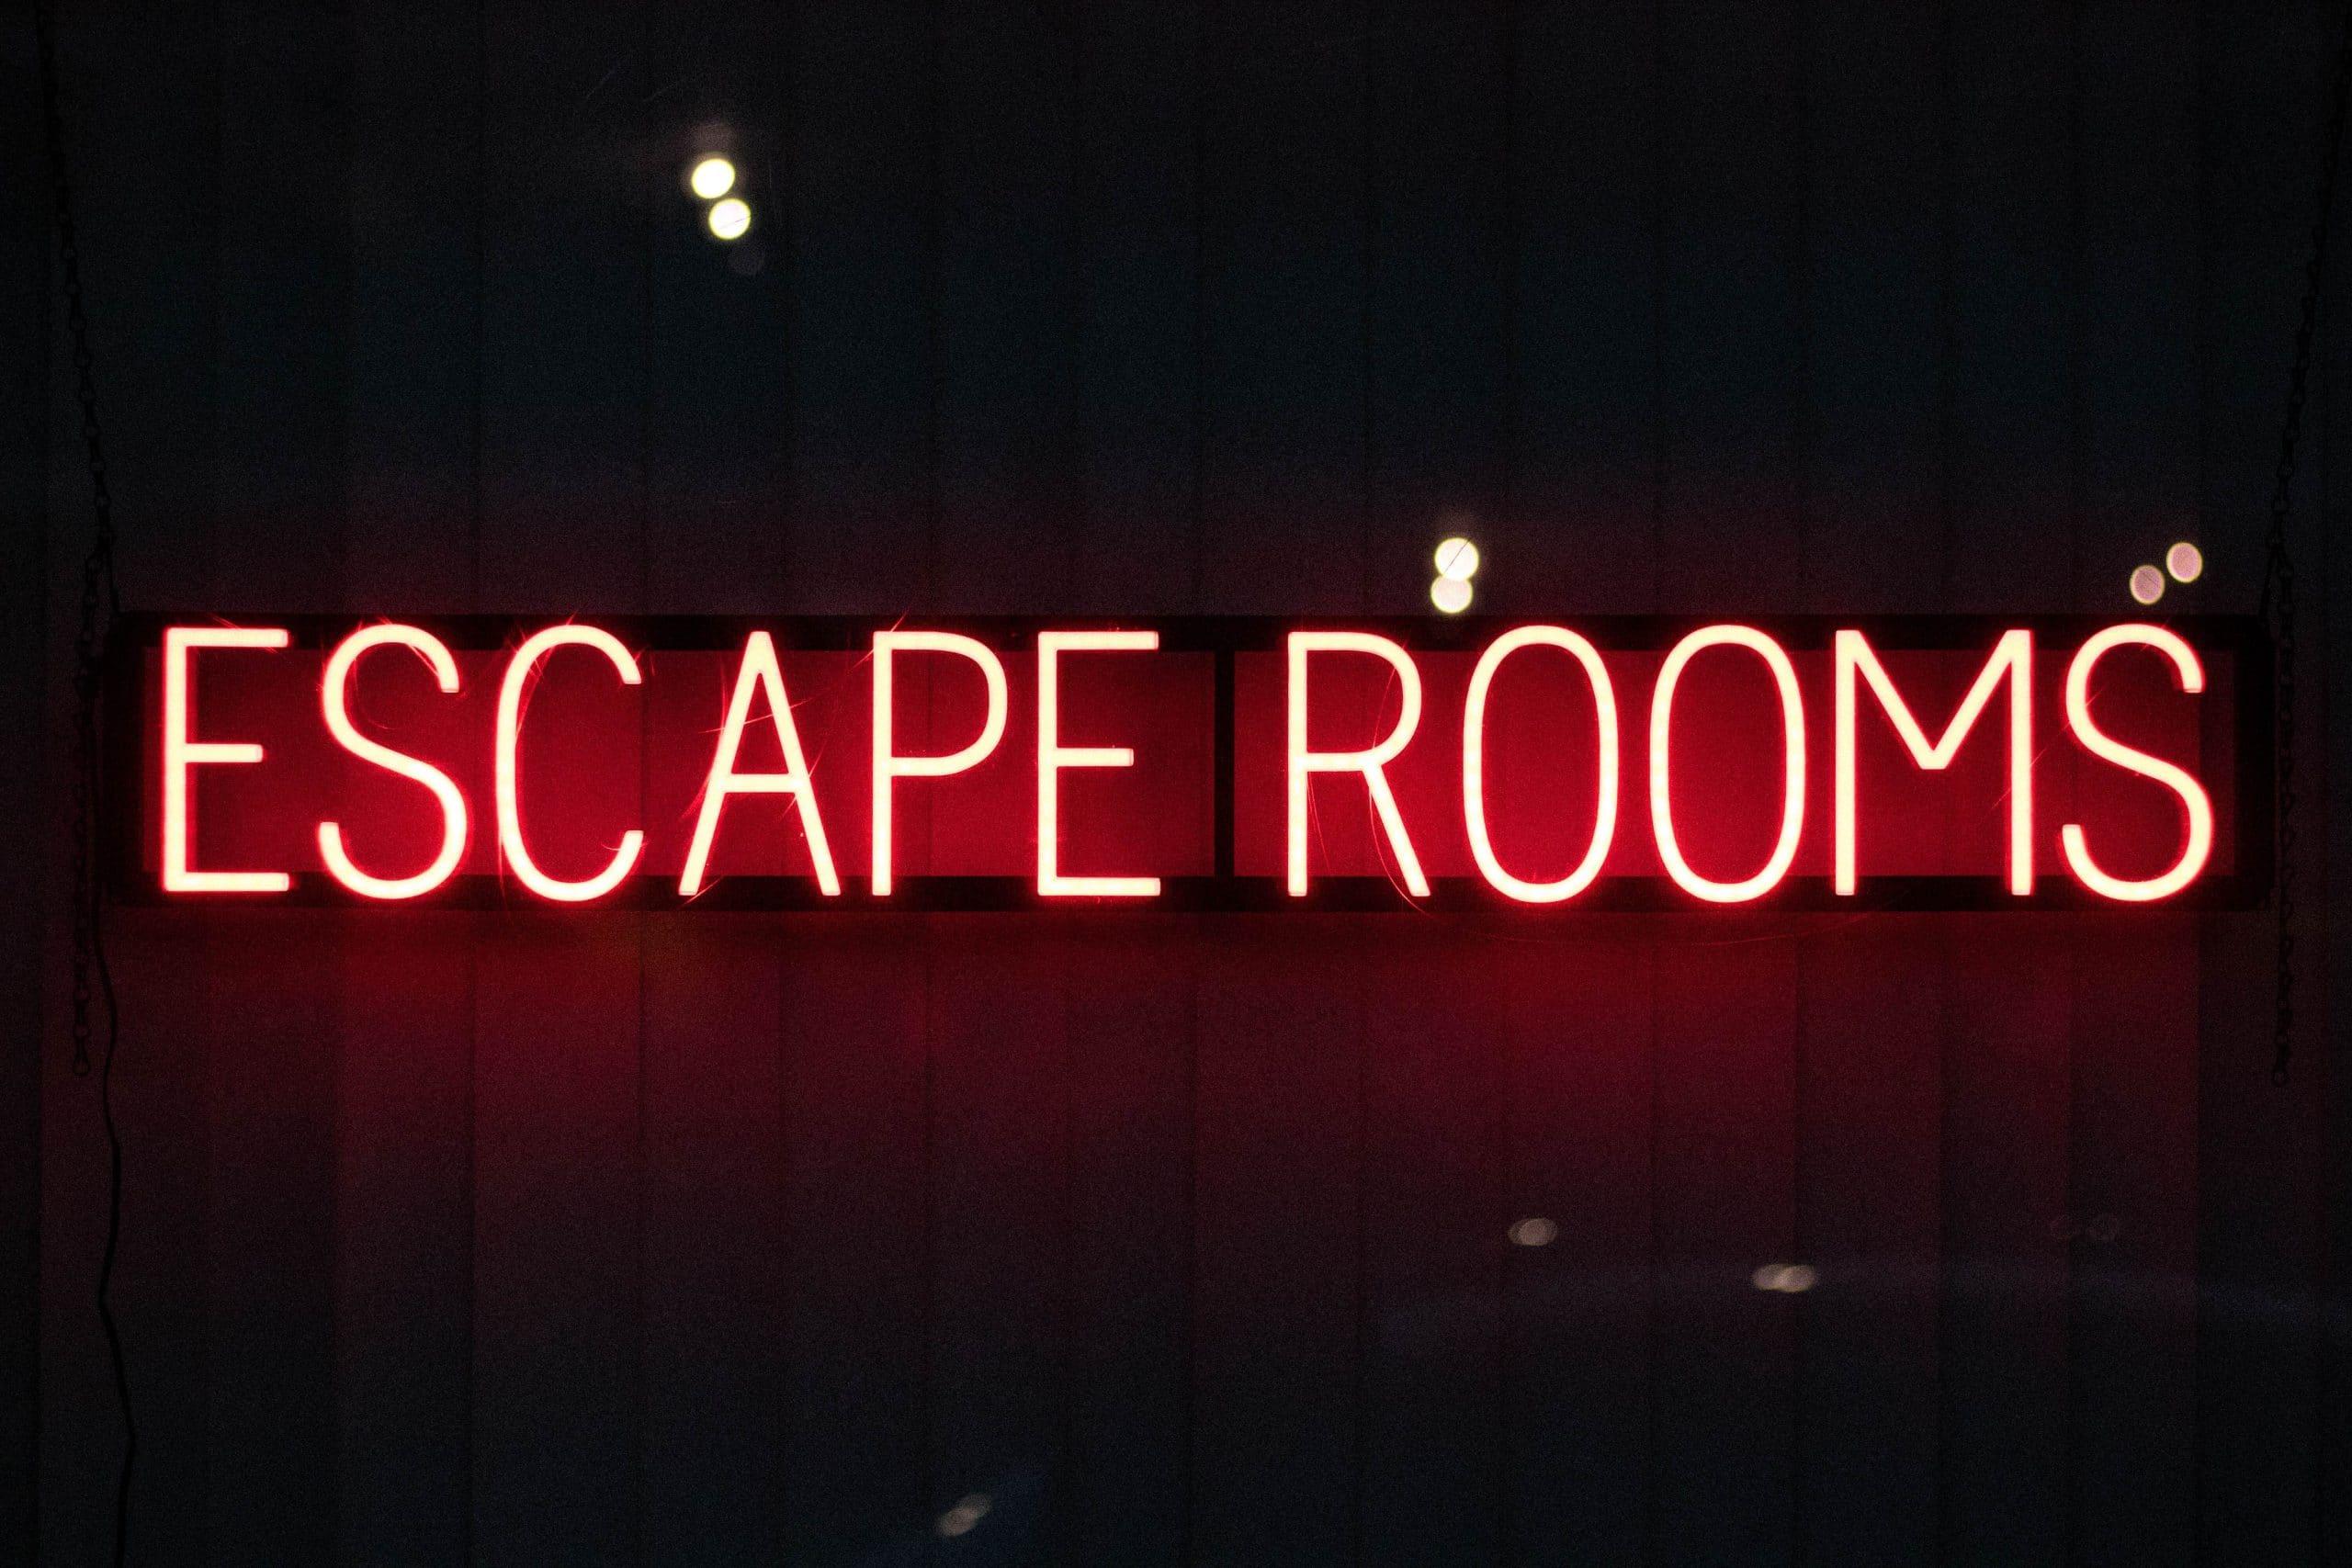 Best Escape Room in Napoli